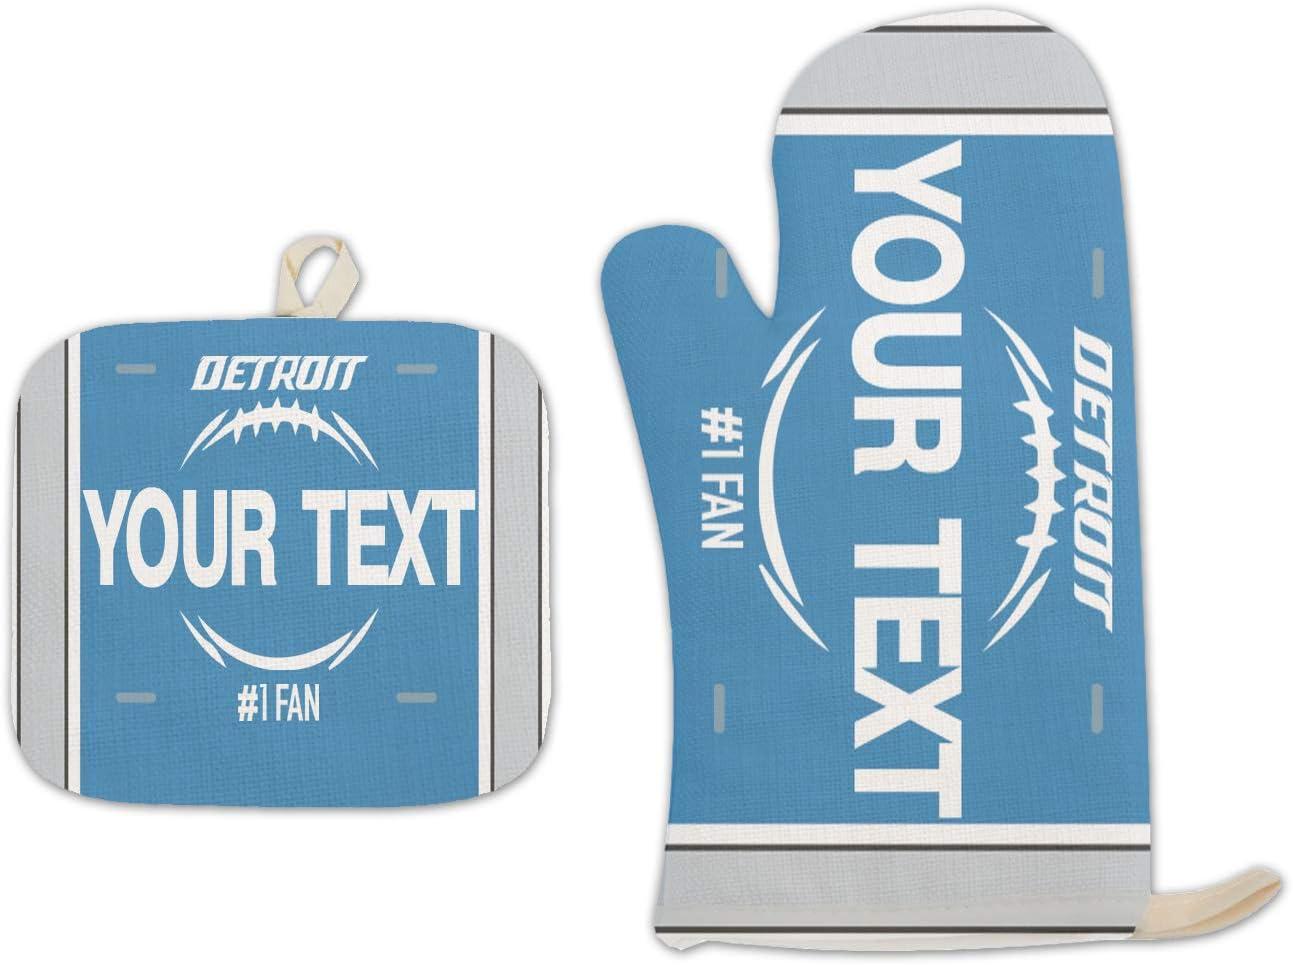 Bleu Reign BRGiftShop Personalized Custom Name Football Team Detroit Linen Oven Mitt and Potholder Set